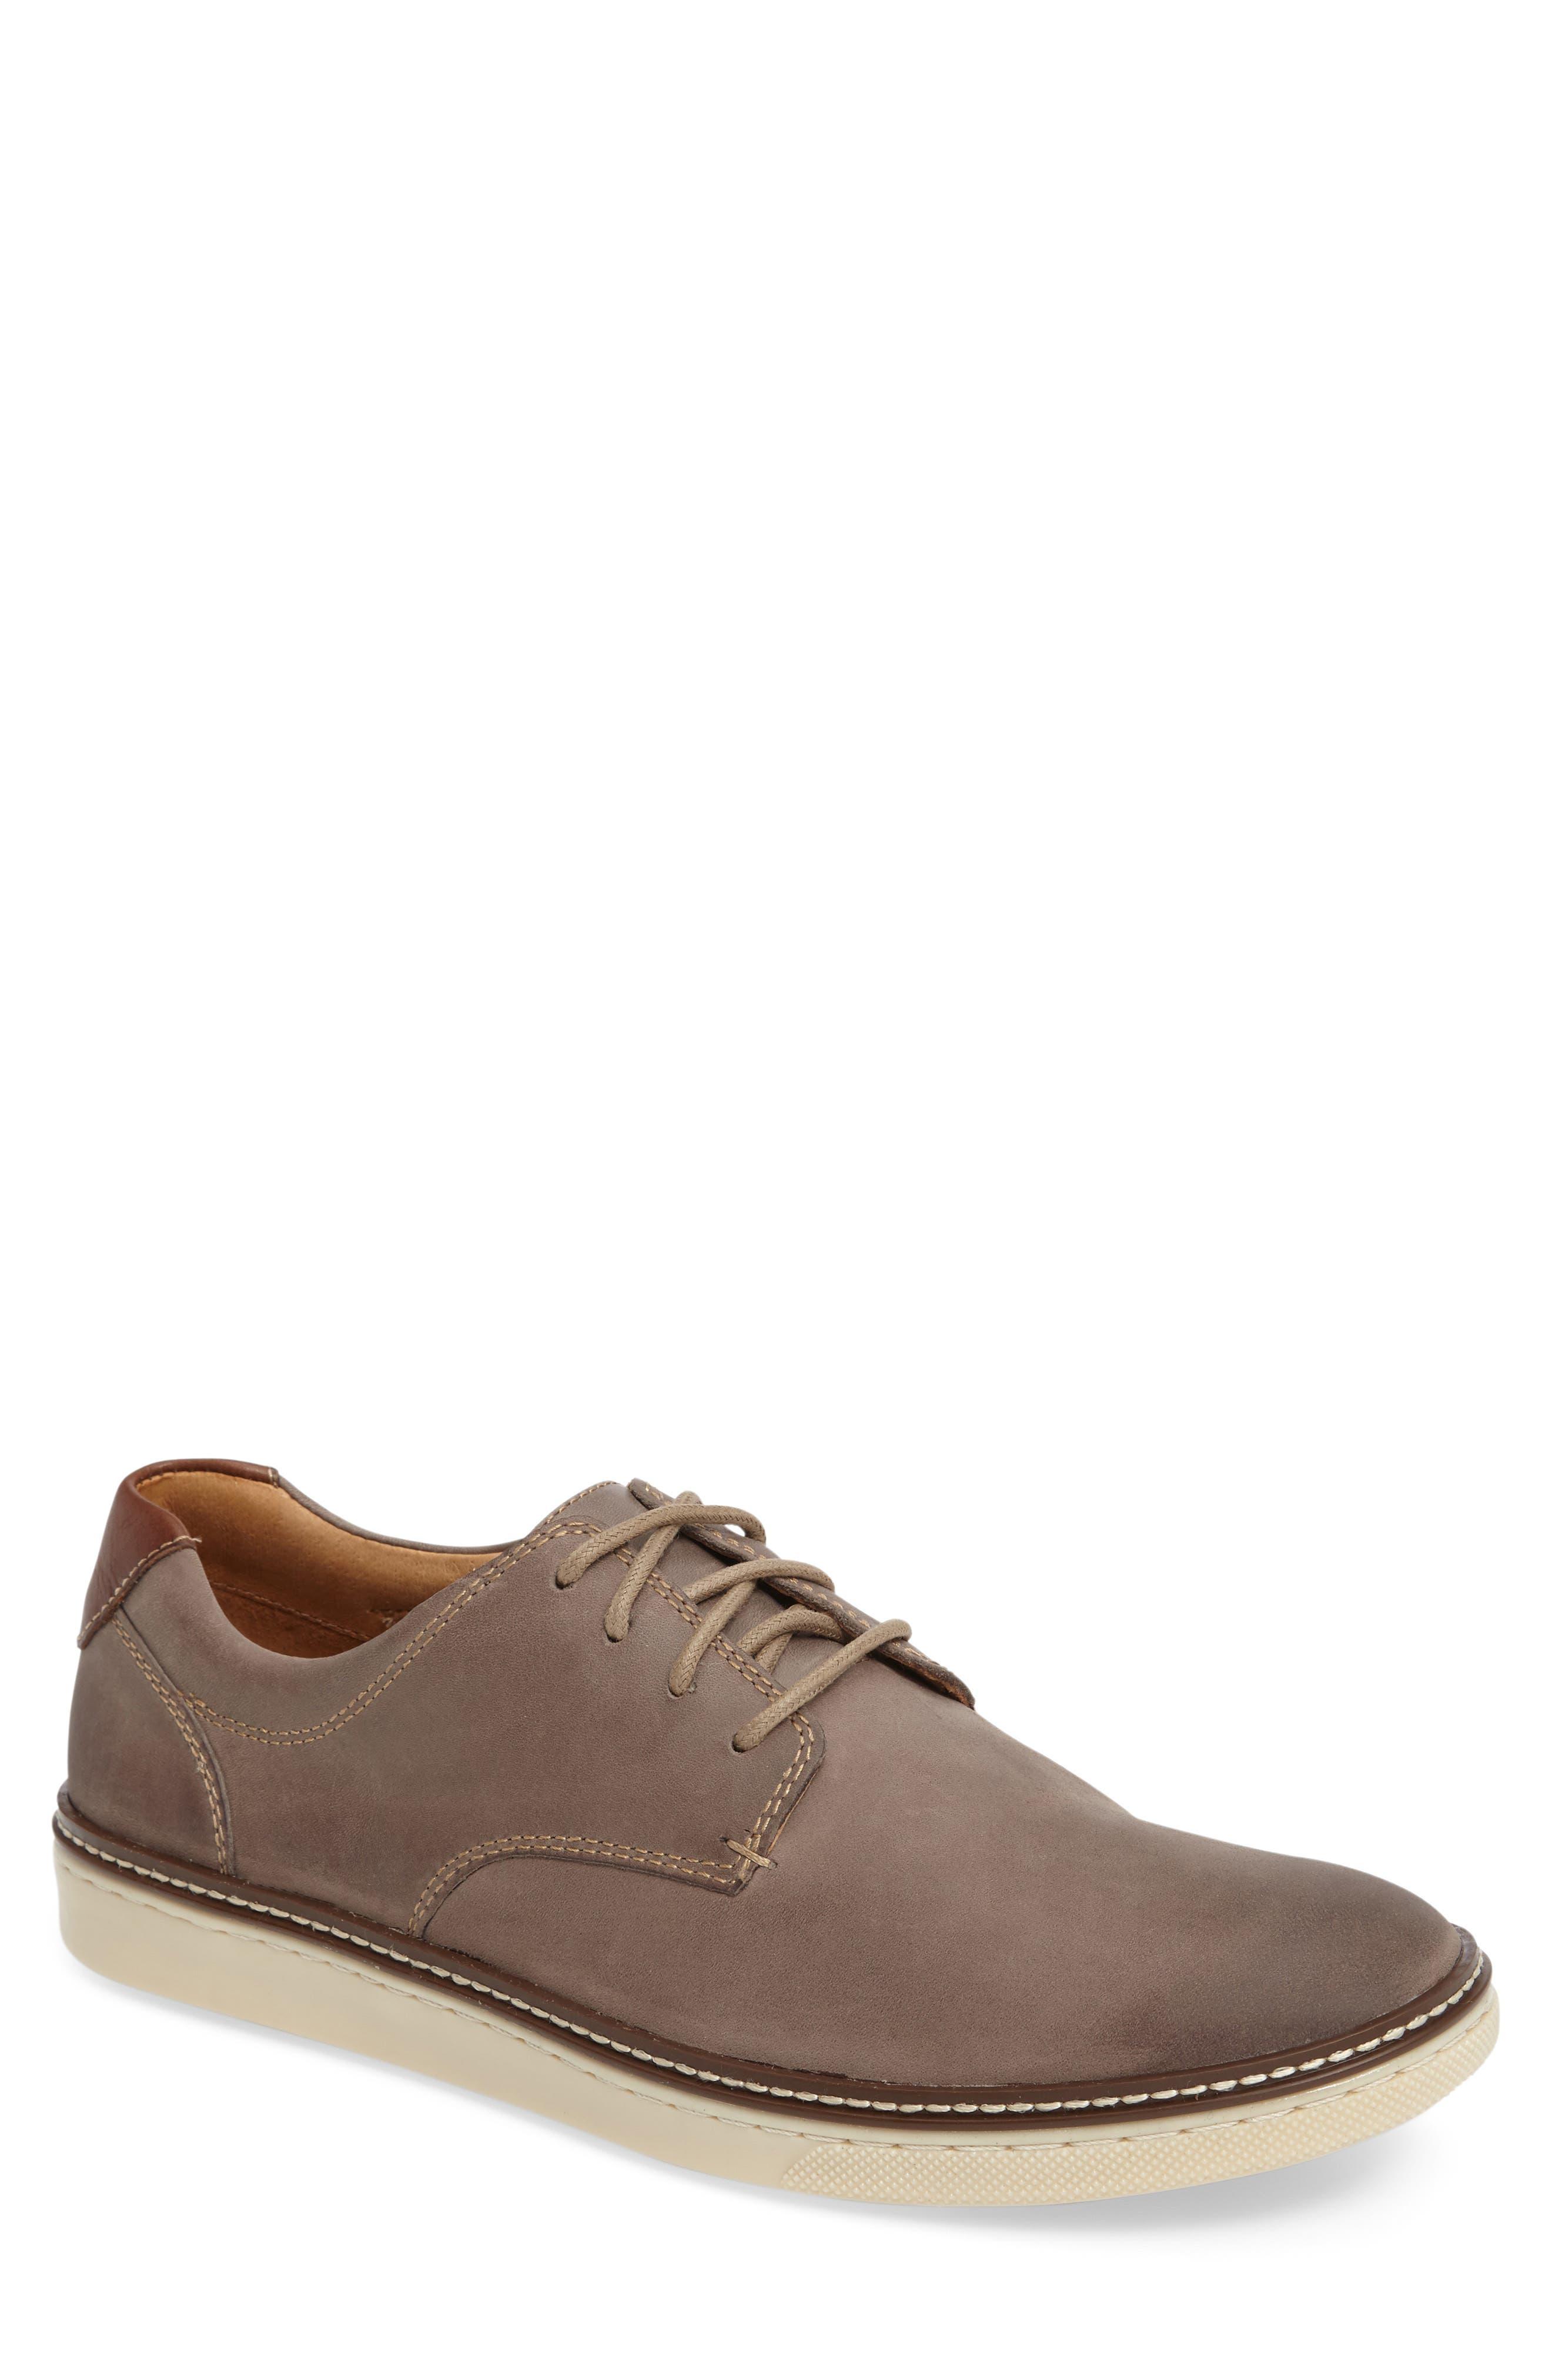 McGuffey Plain Toe Sneaker,                             Main thumbnail 1, color,                             GREY NUBUCK LEATHER